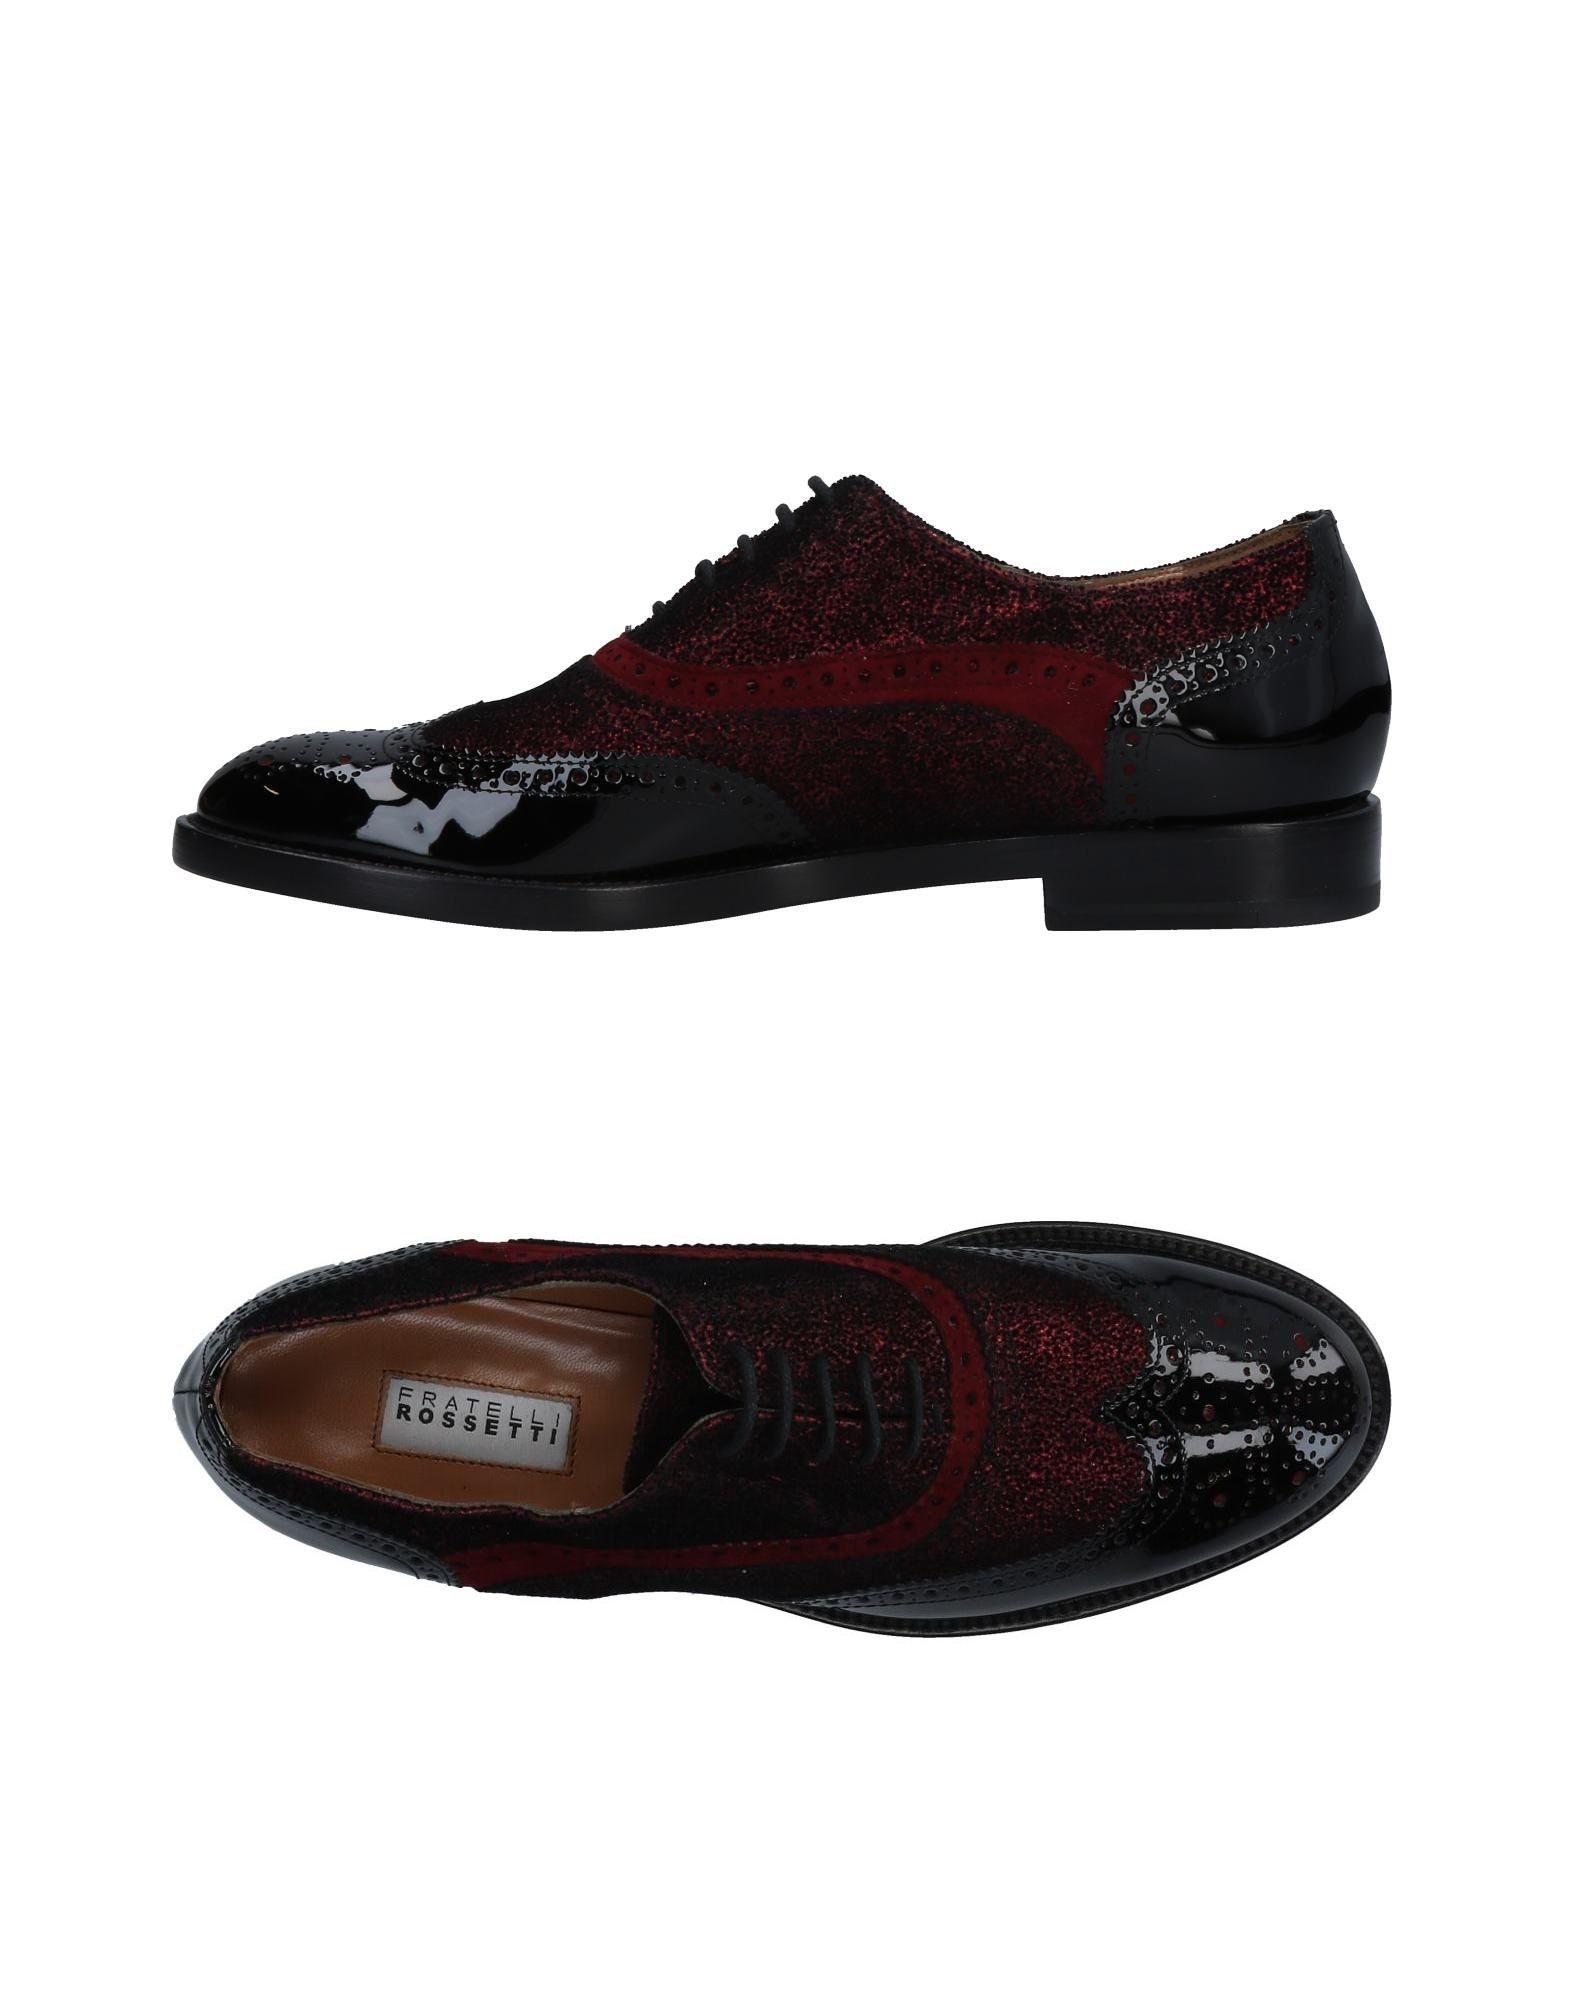 Fratelli Rossetti Schnürschuhe Damen  11473606QFGut aussehende strapazierfähige Schuhe